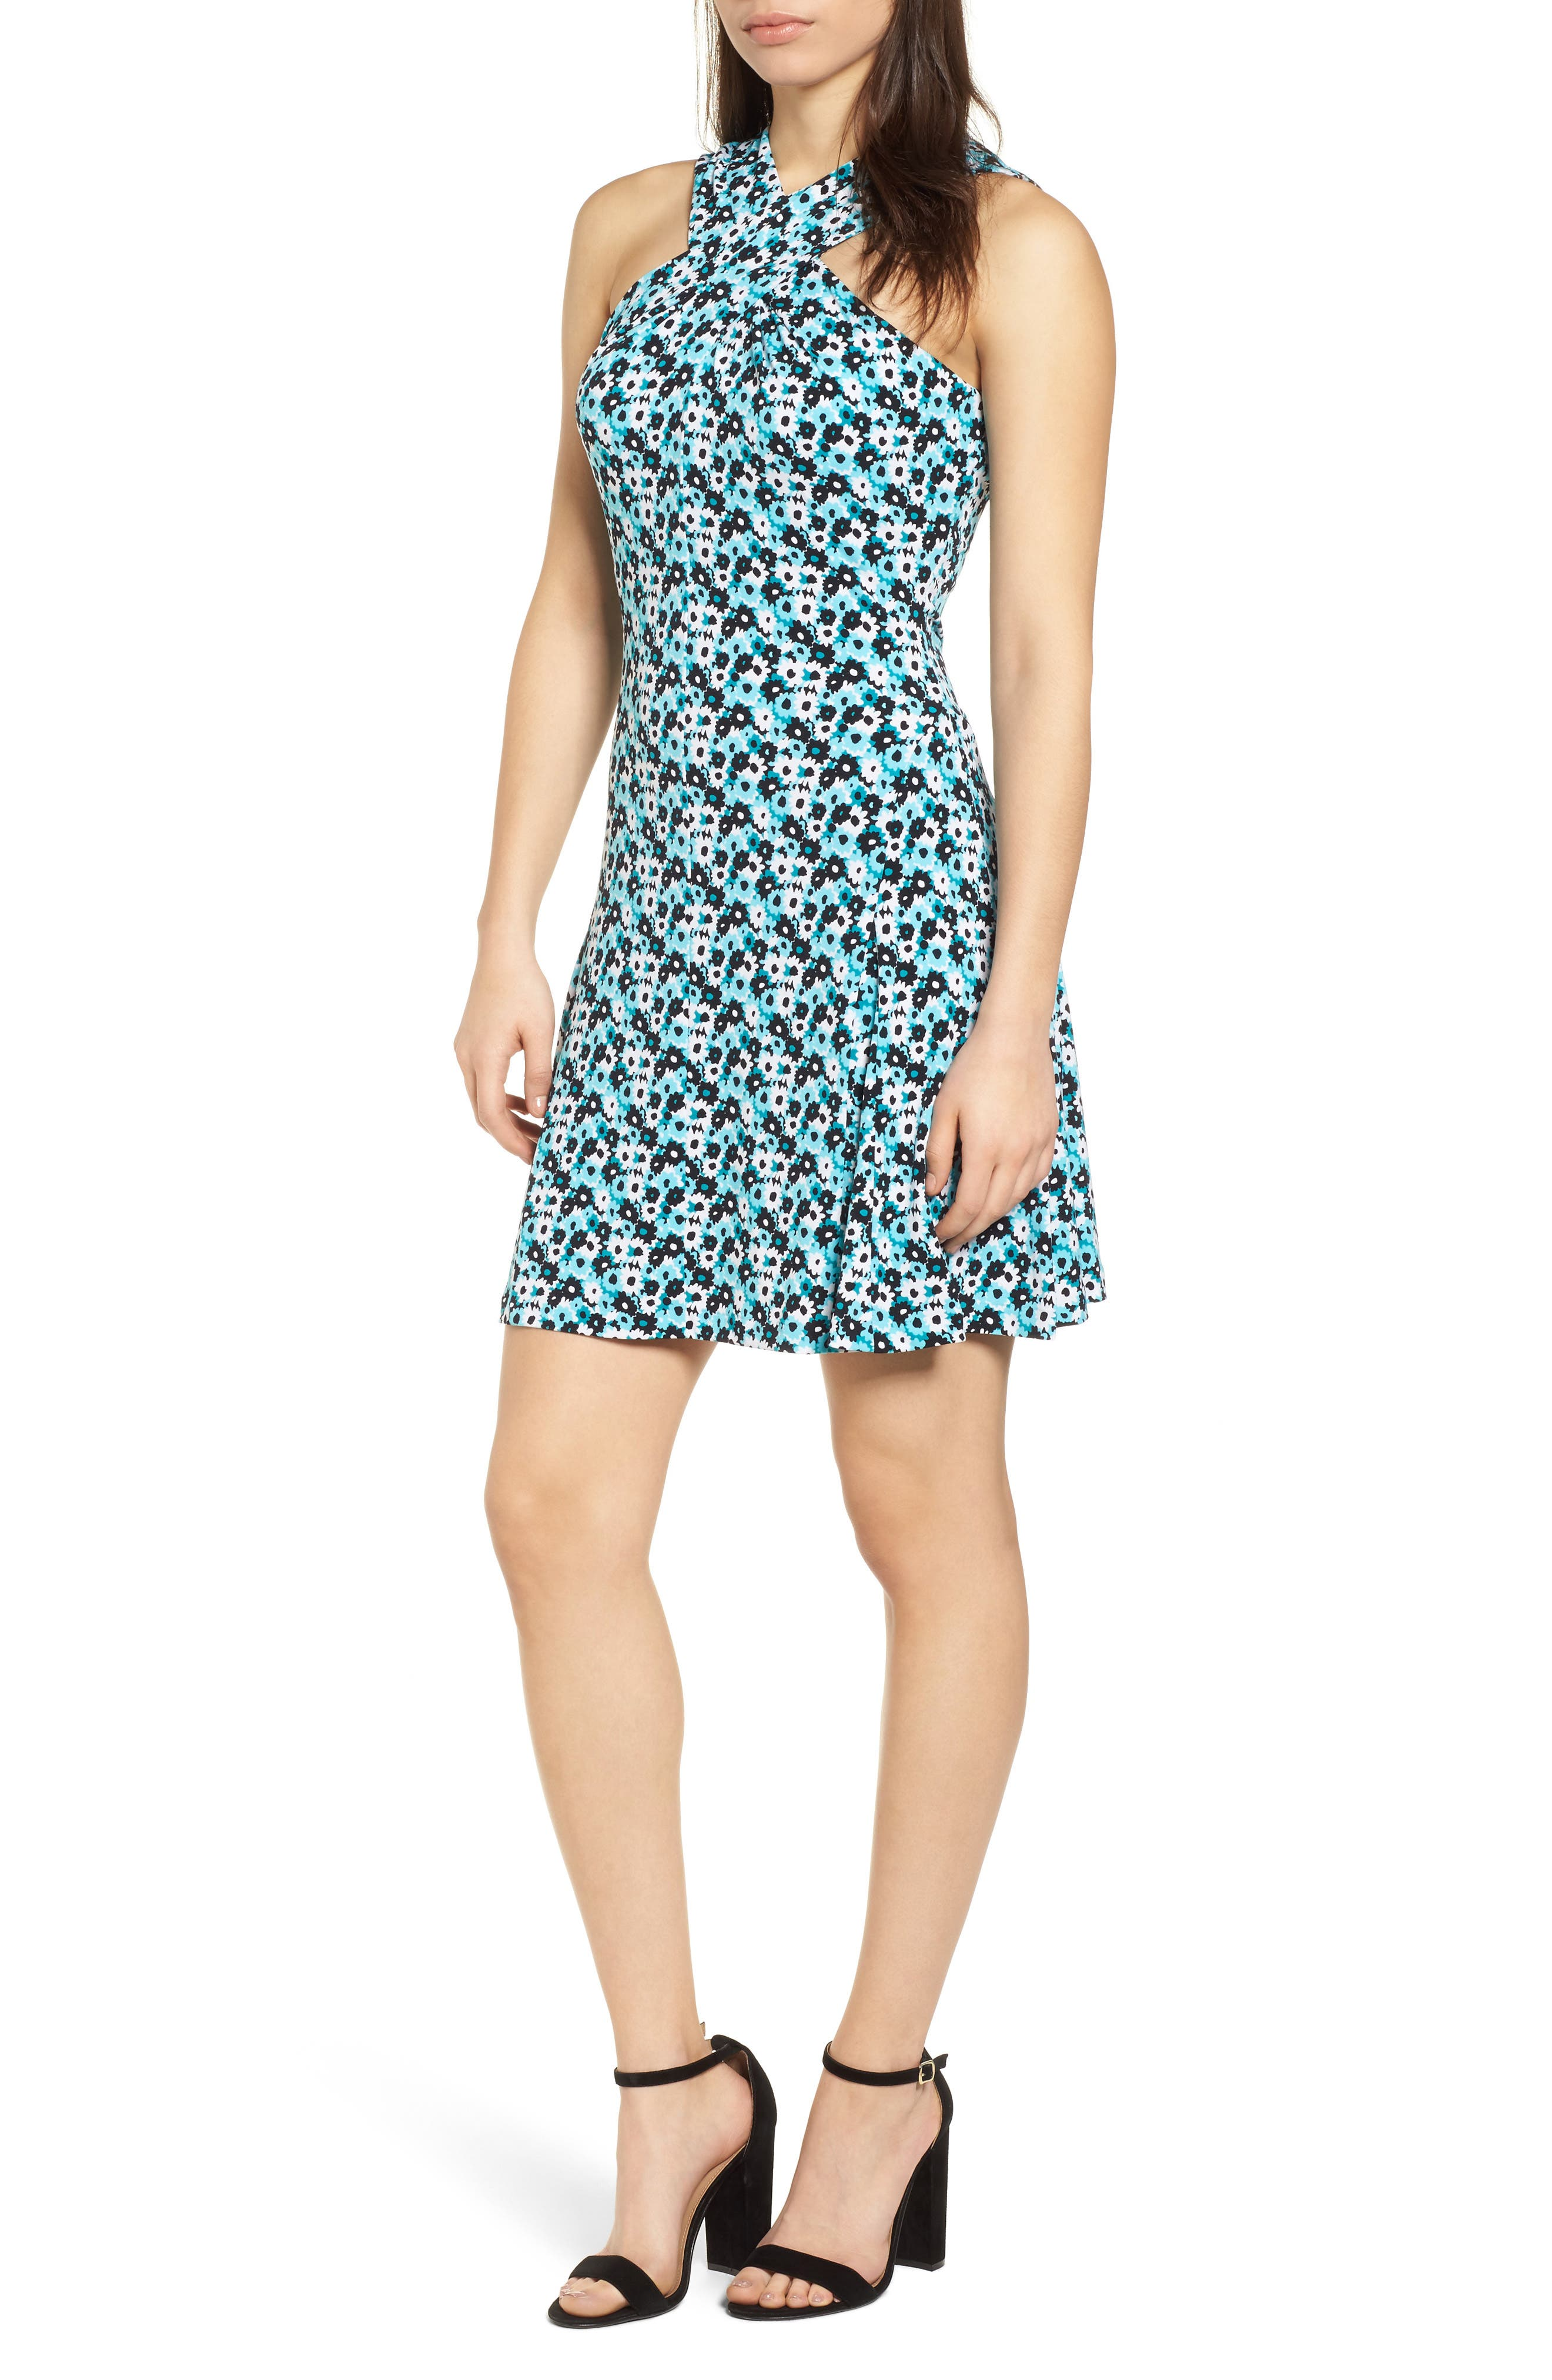 Carnations Cross Neck Fit and Flare Dress,                             Main thumbnail 1, color,                             Tile Blue/ Black Multi